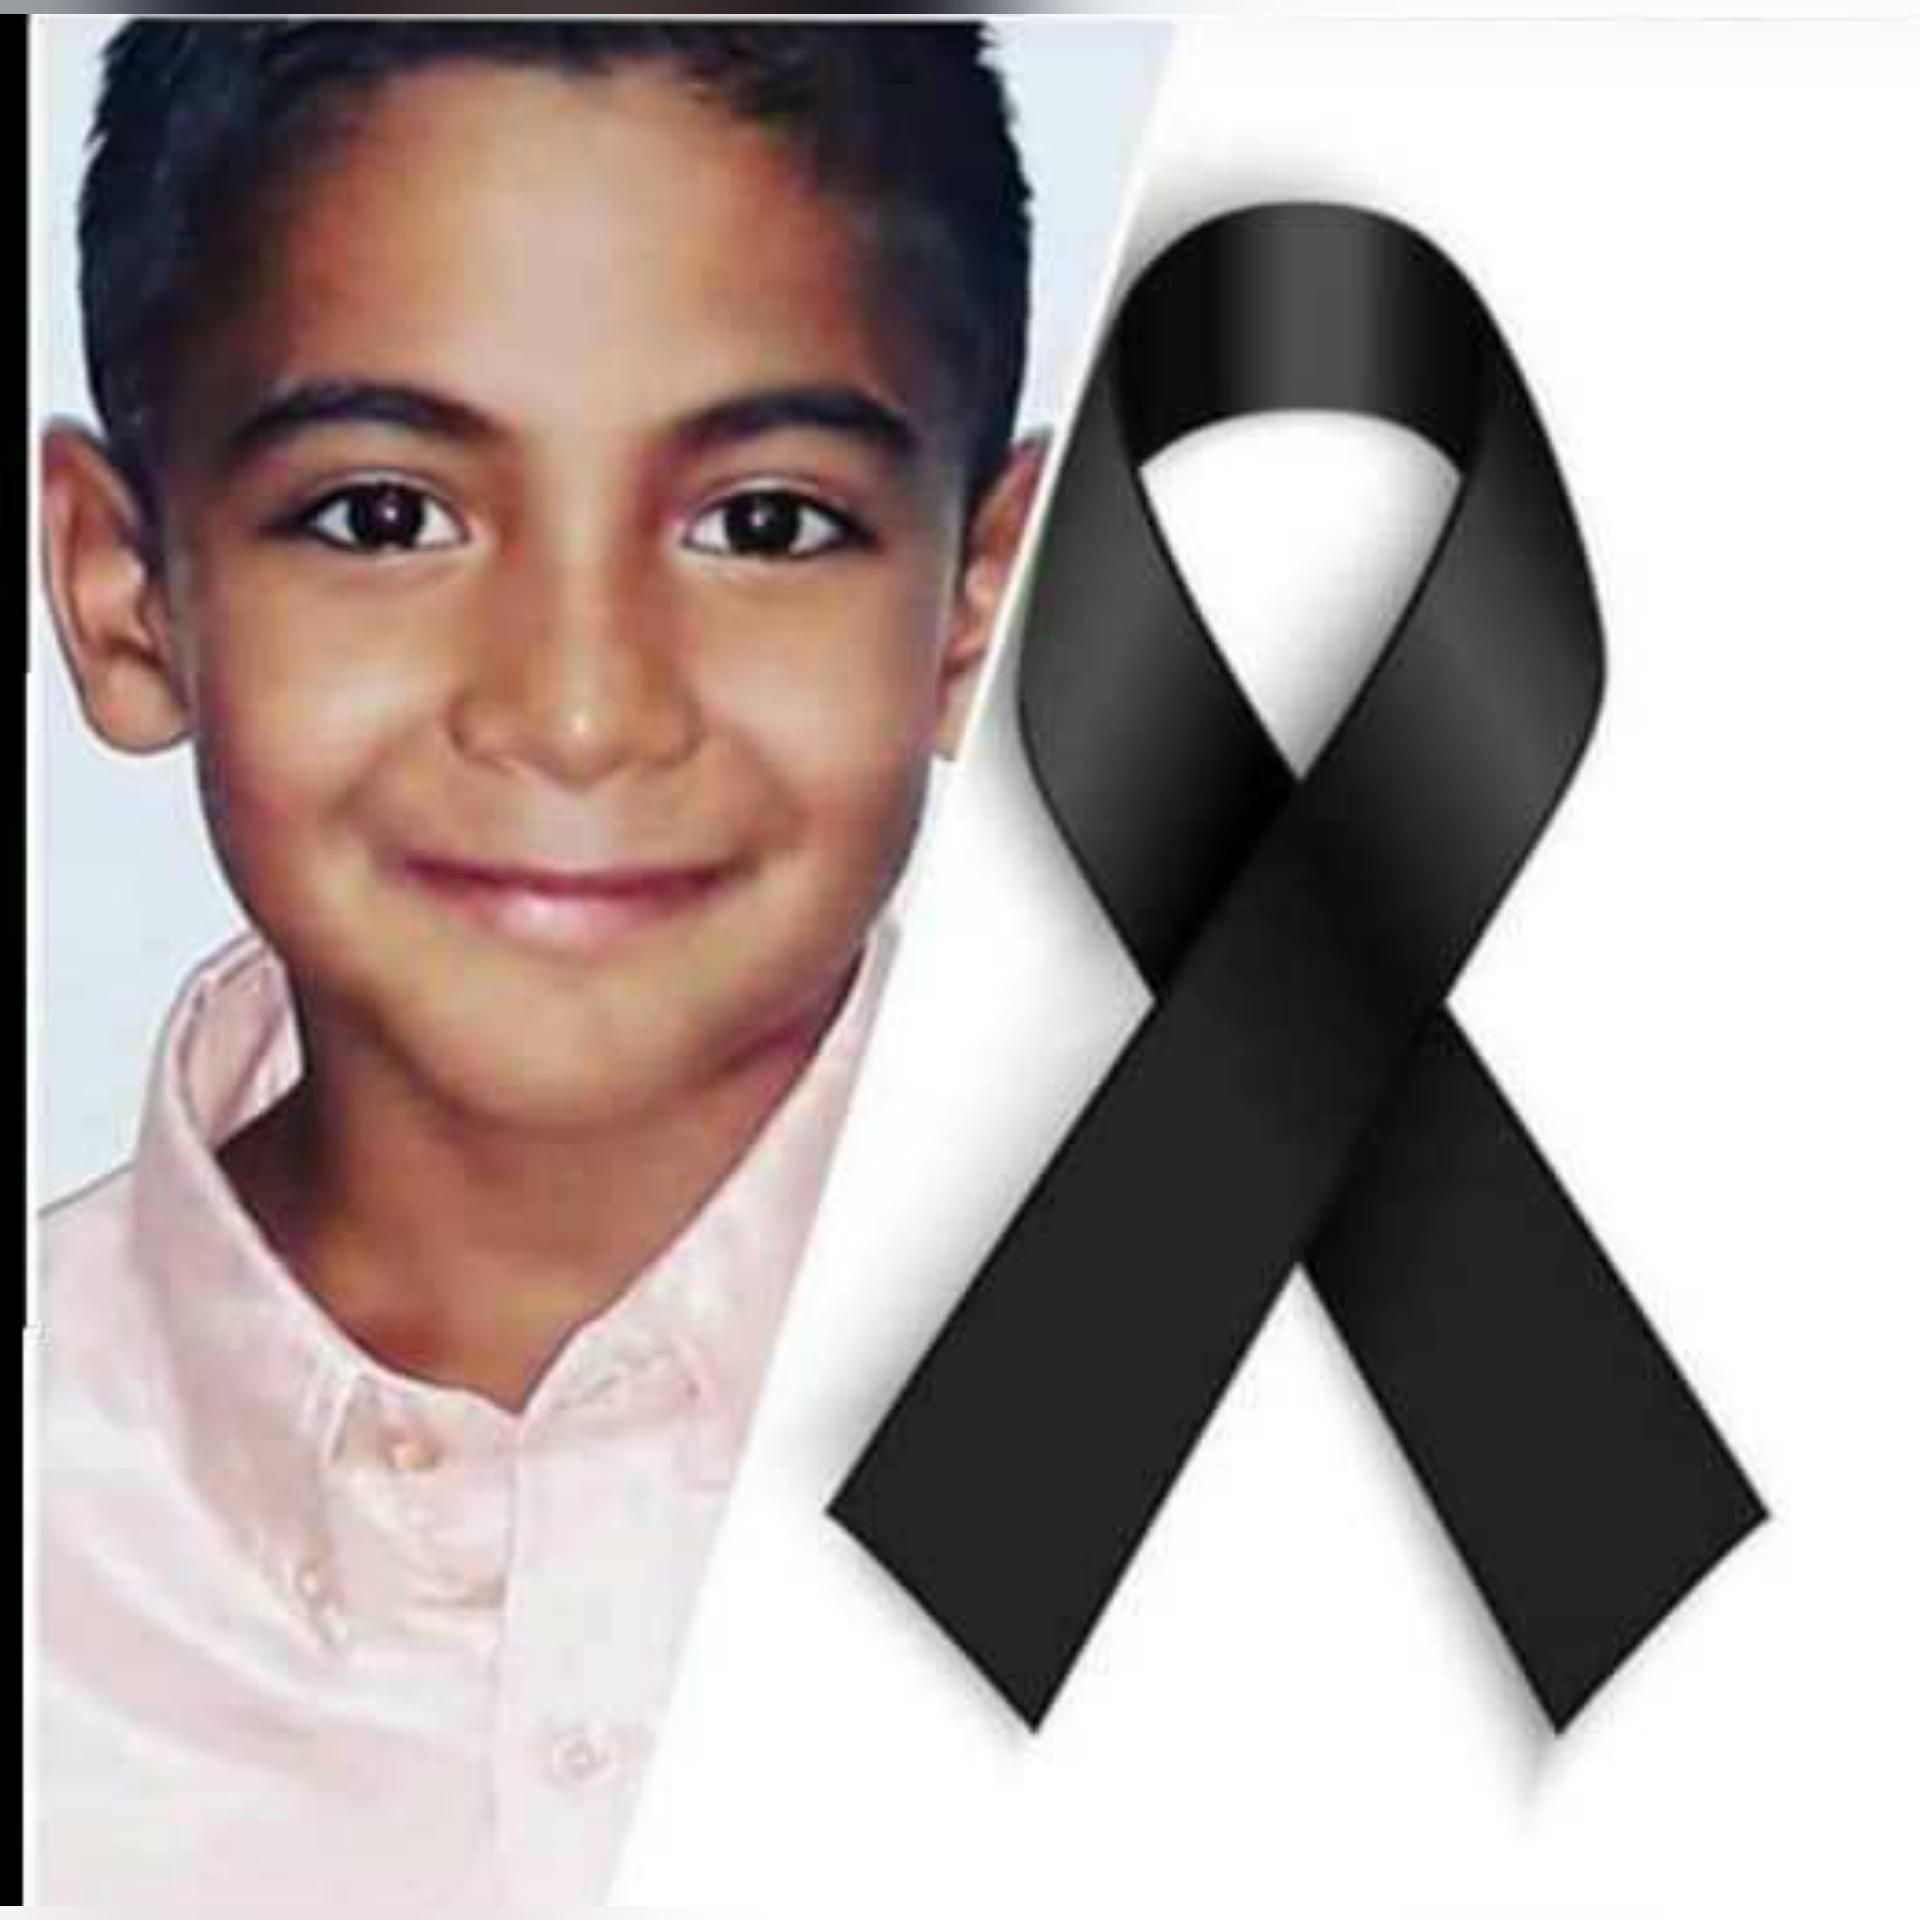 Emisair Rafael Agustín Tovar de 9 años murió calcinado.